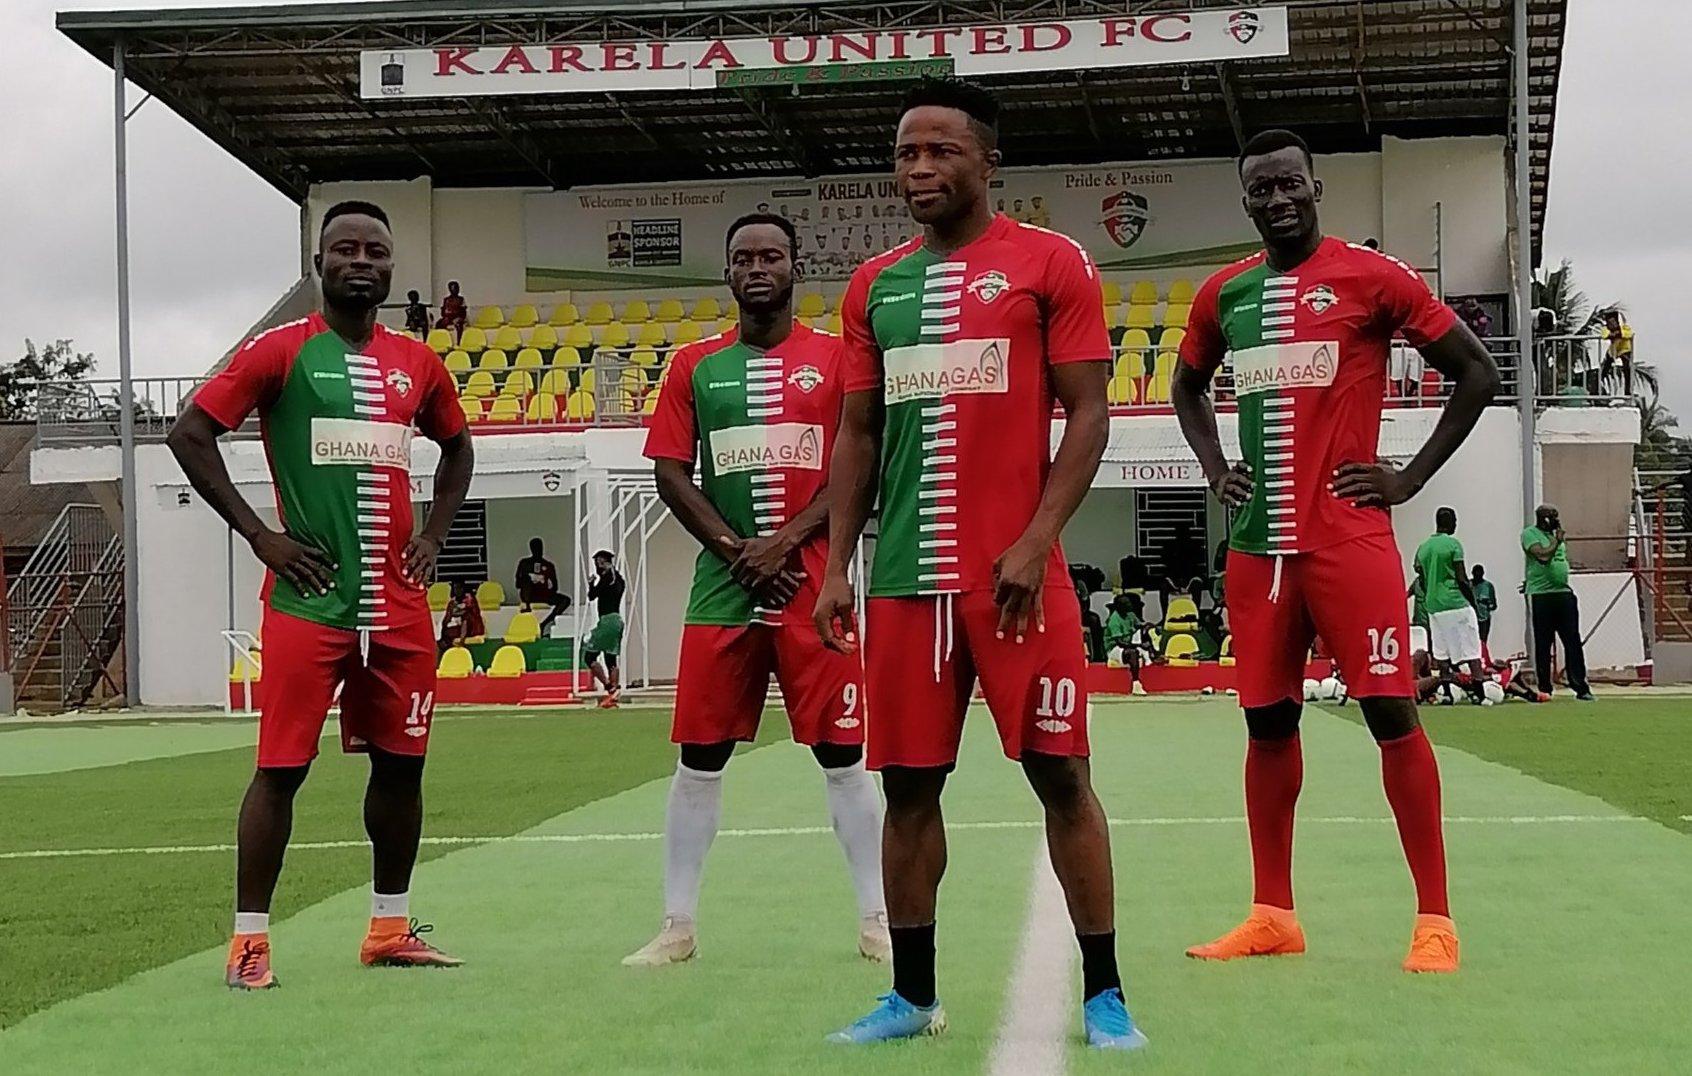 Karela United